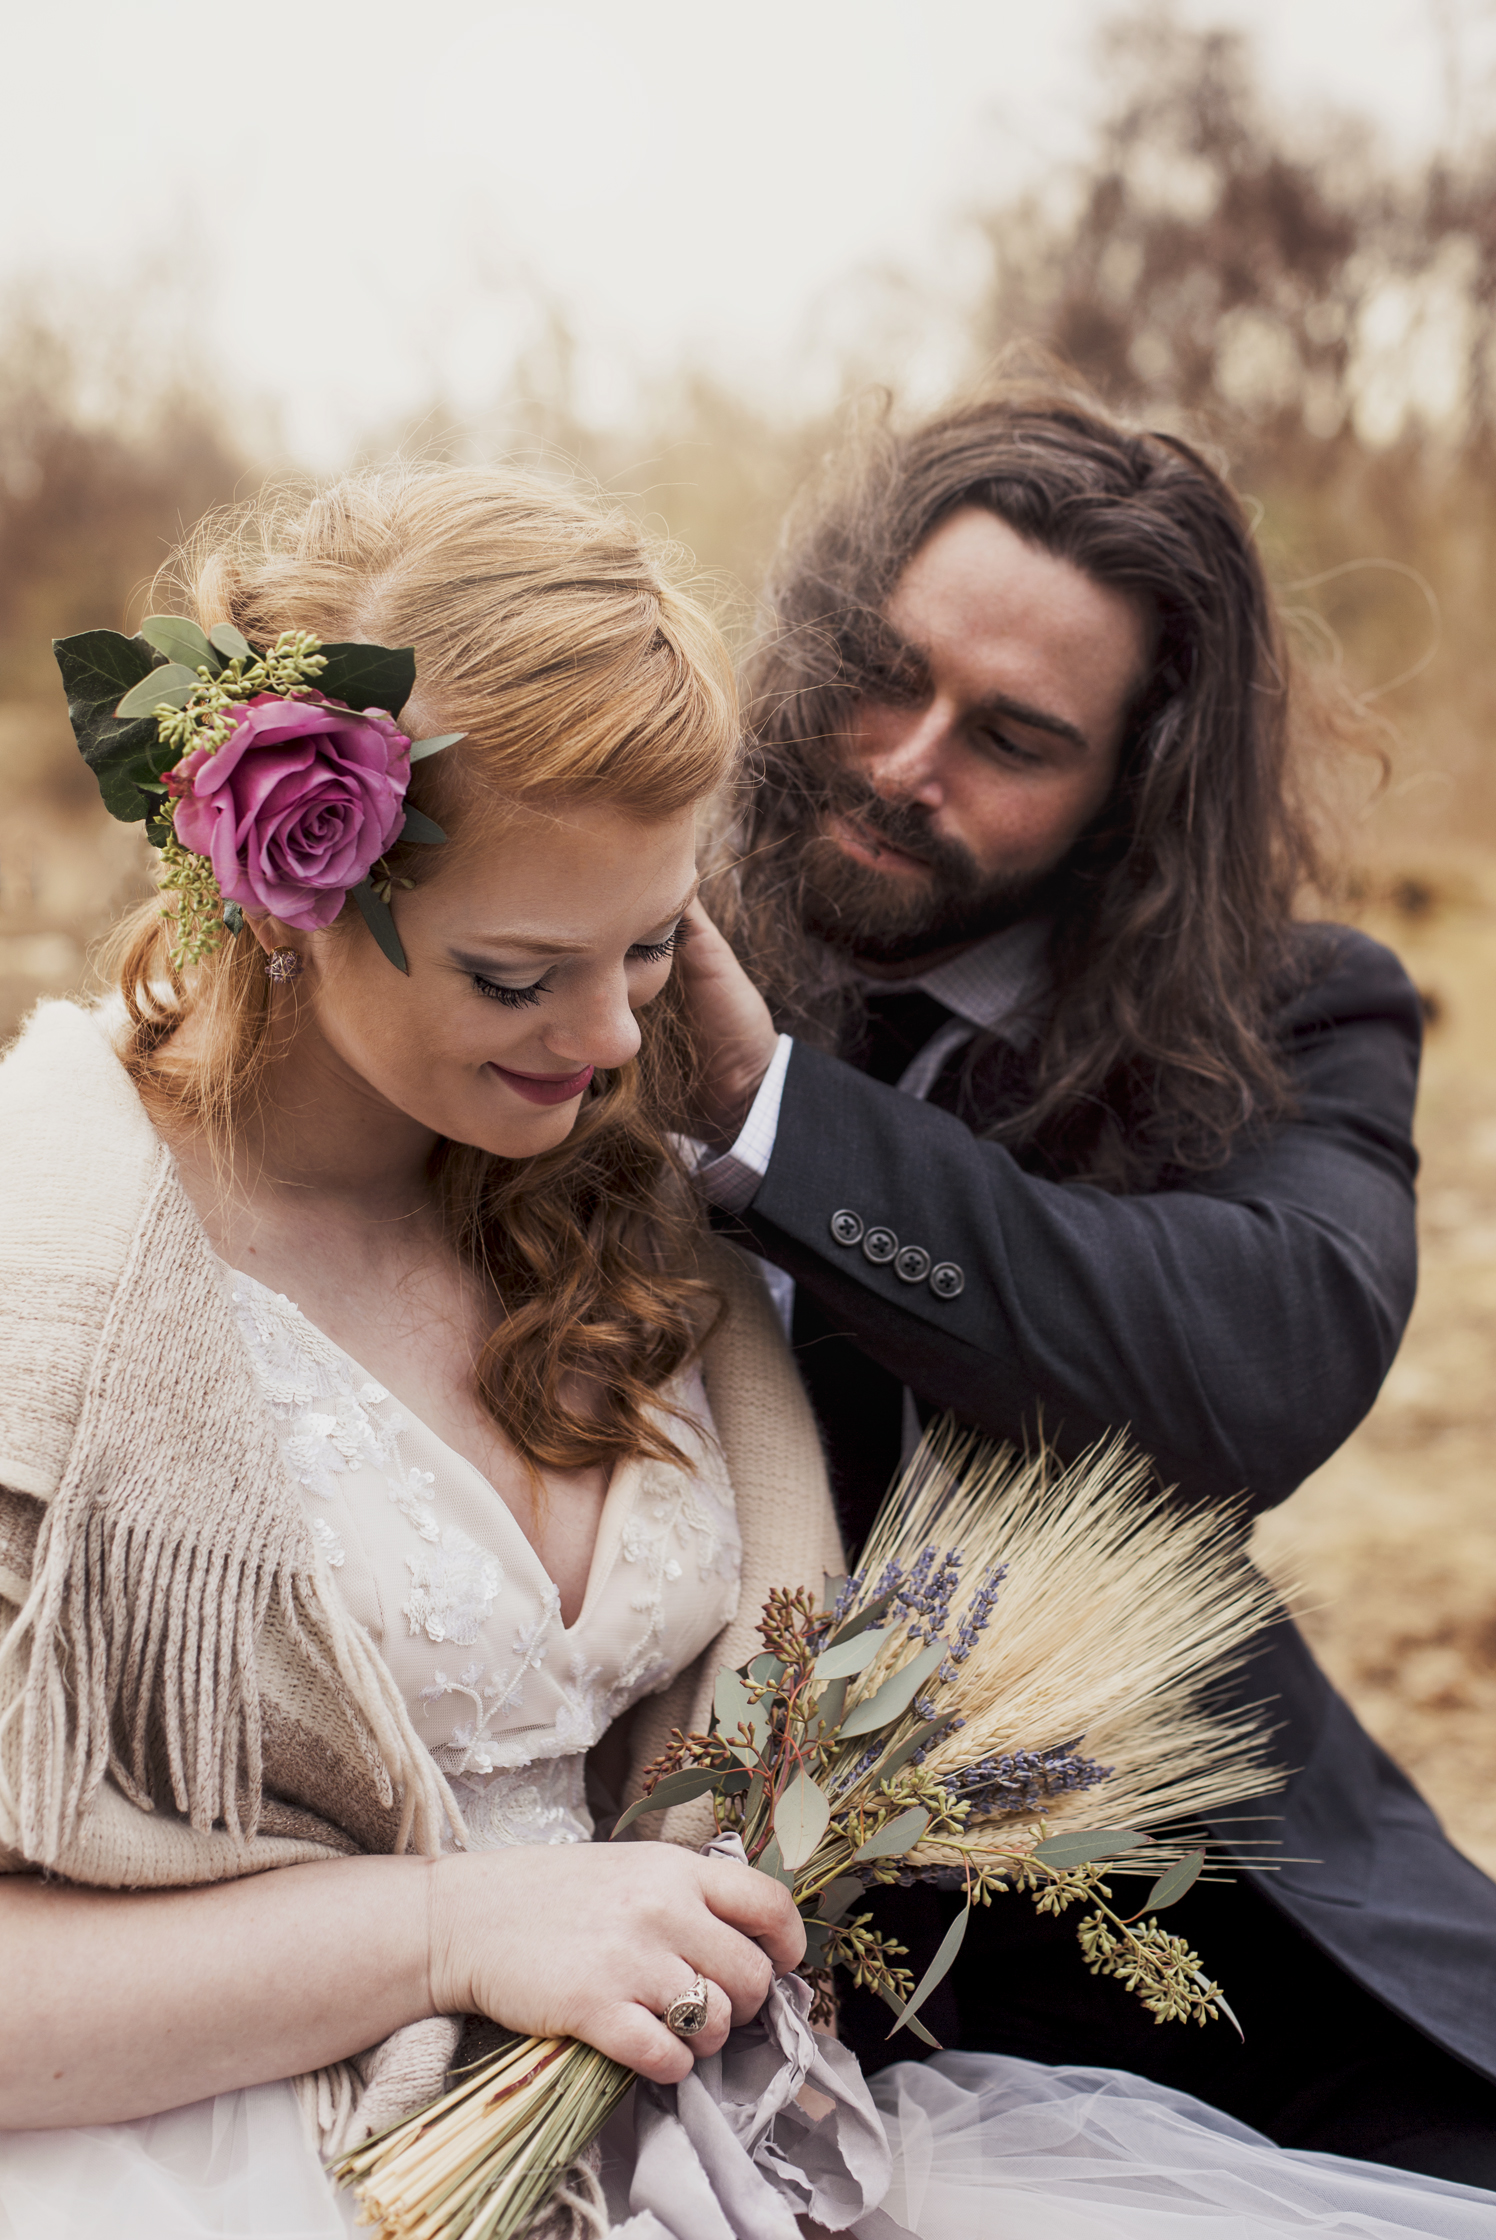 Sara + Matt + Ella _Give Back Bride_Styled Wedding Shoot _K. Stoddard Photography018.jpg